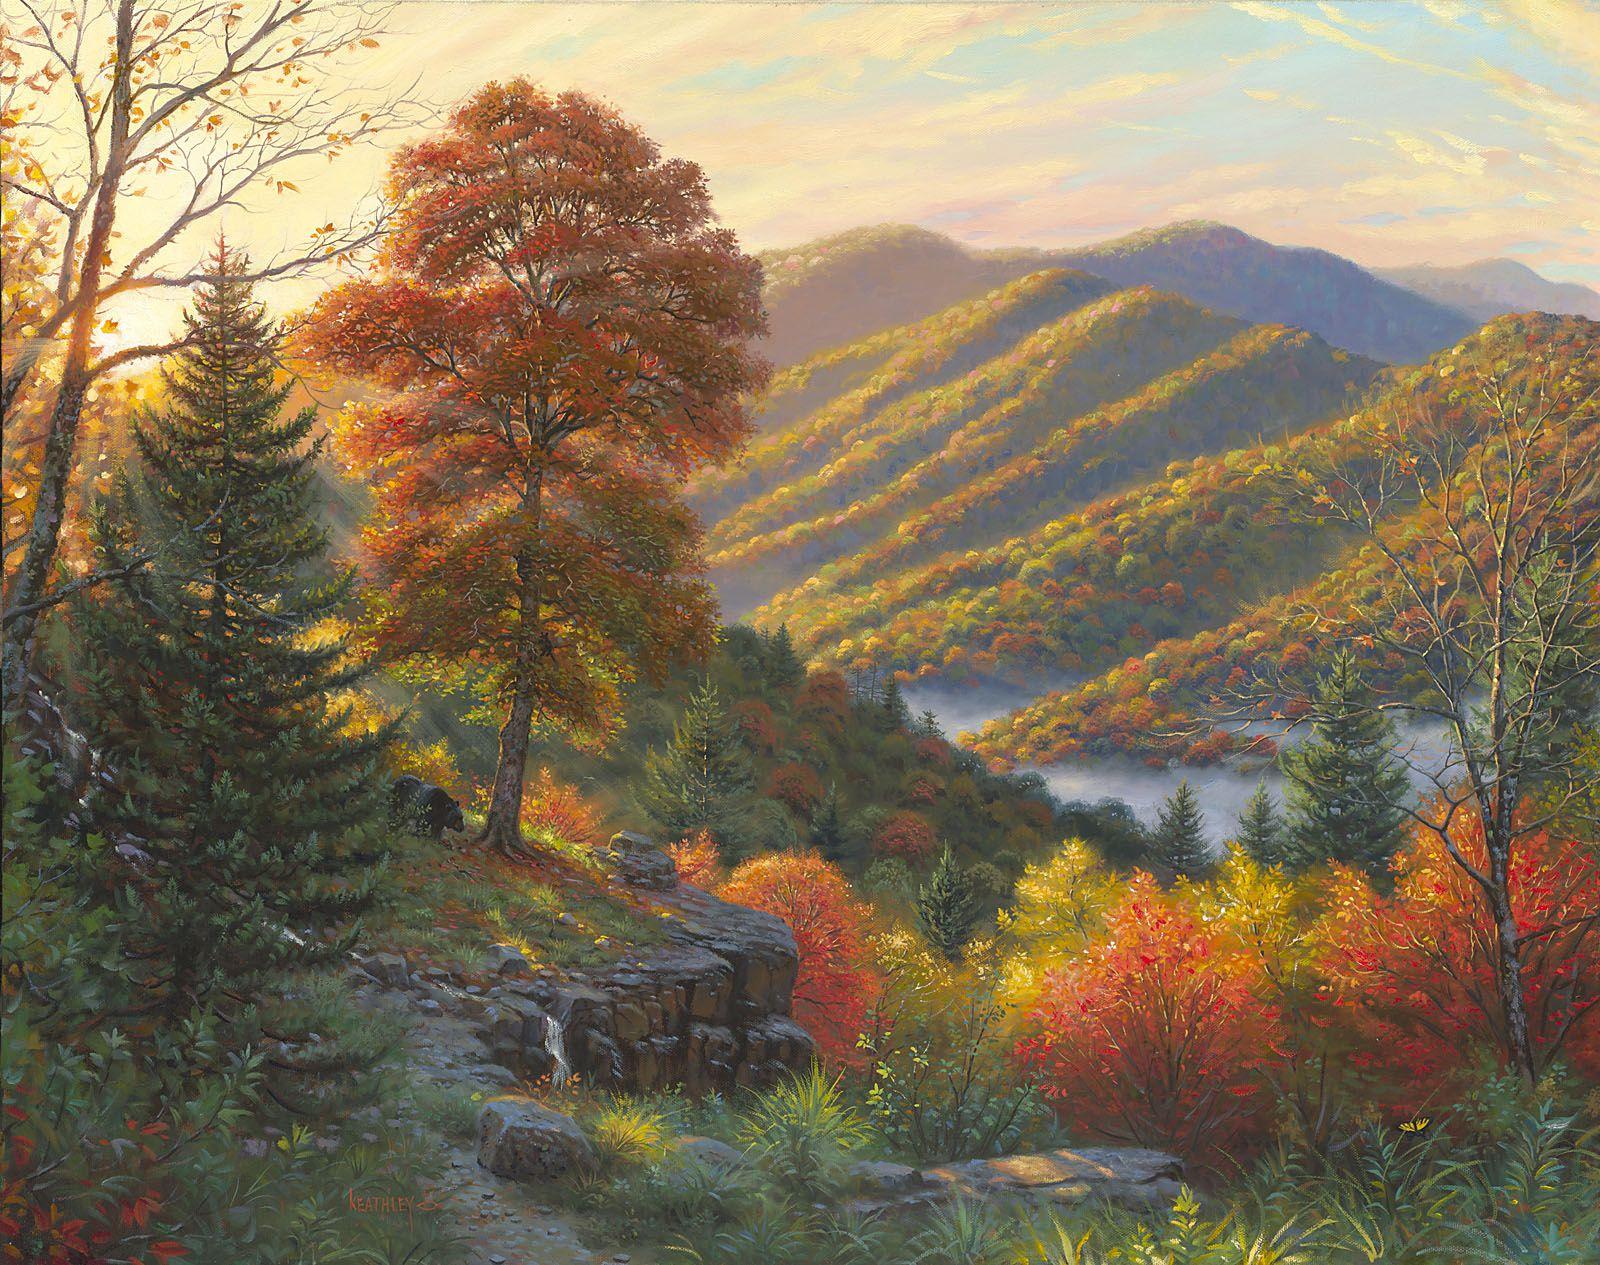 Newfound Memories Mark Keathley Great Smoky Mountains In Autumn Art Of